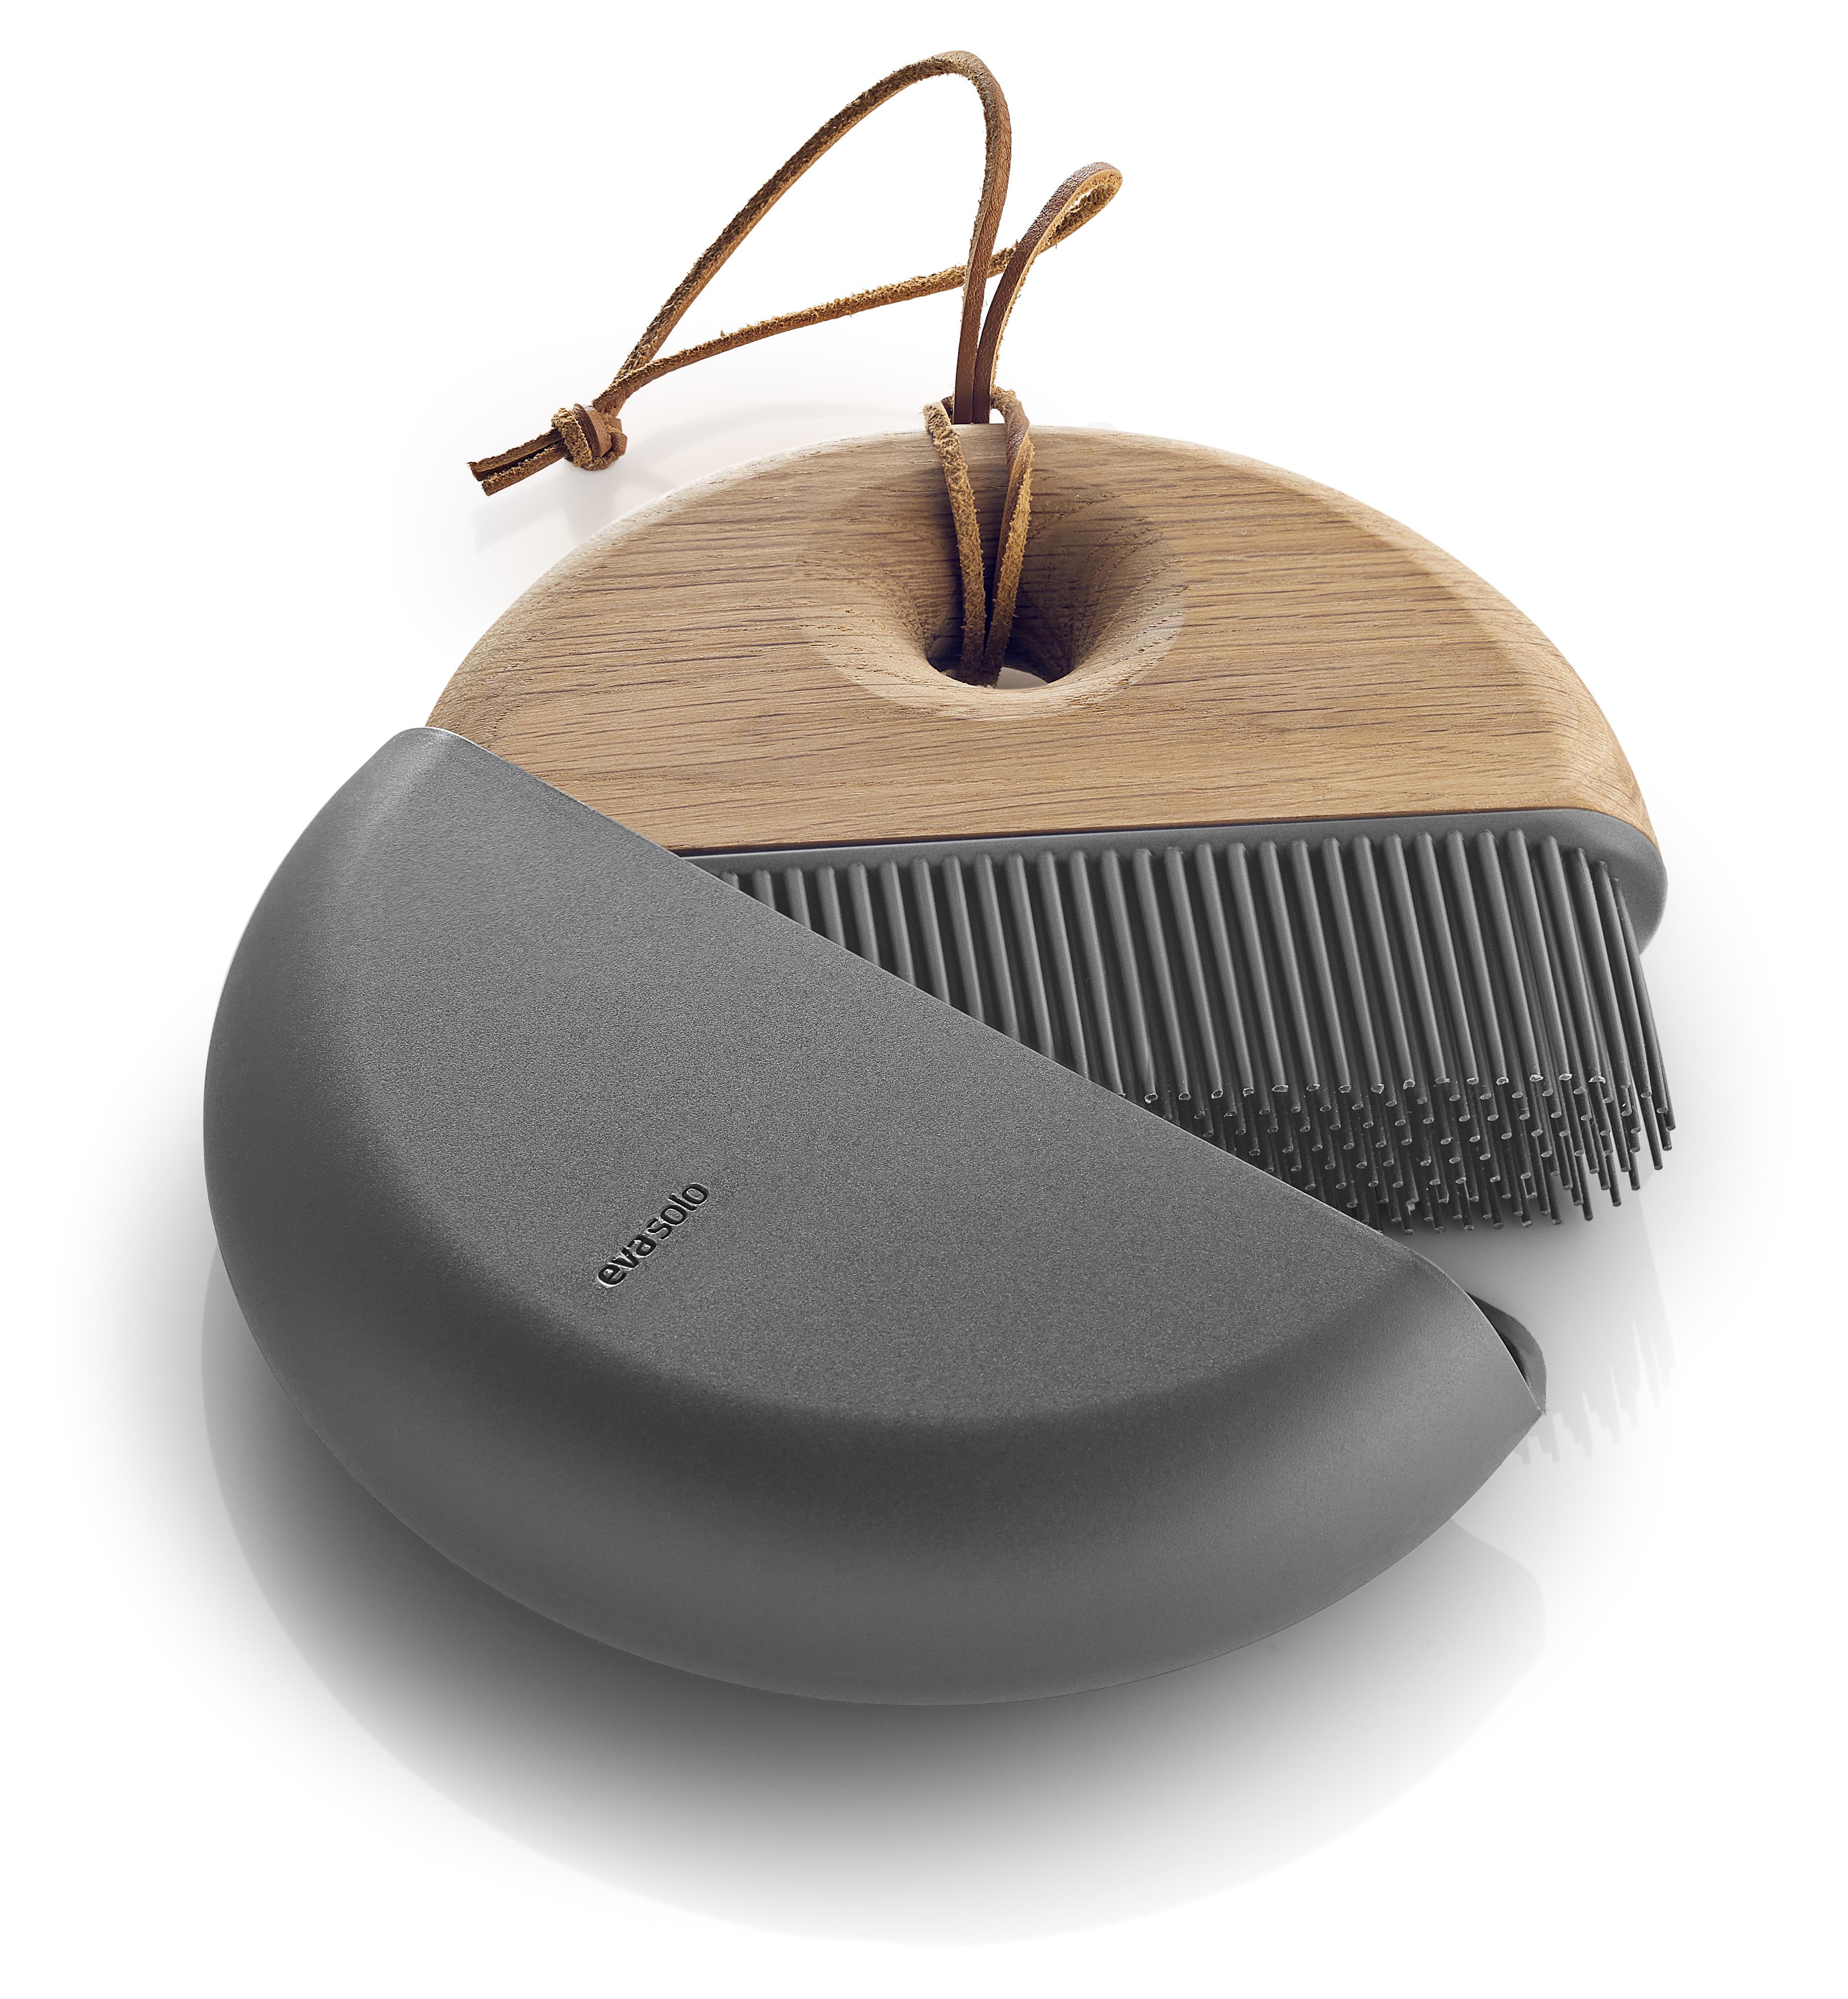 Eva Solo - Sweep Dustpan & Bruch Set (520430)